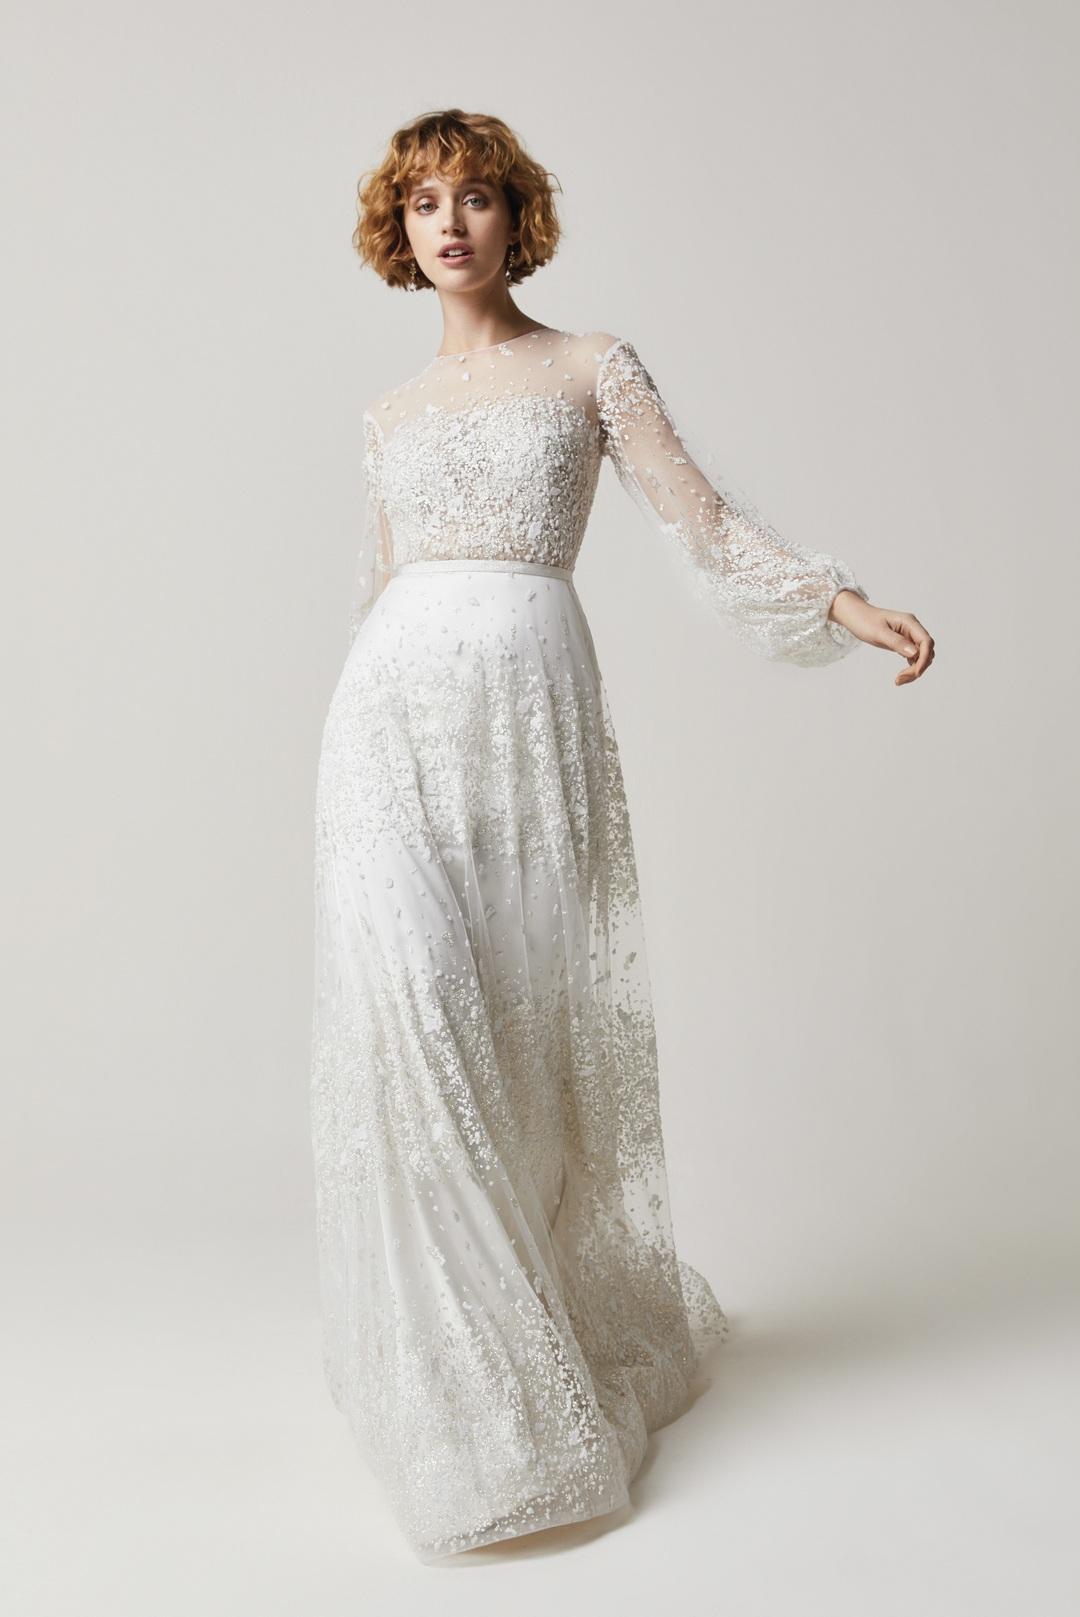 218 dress photo